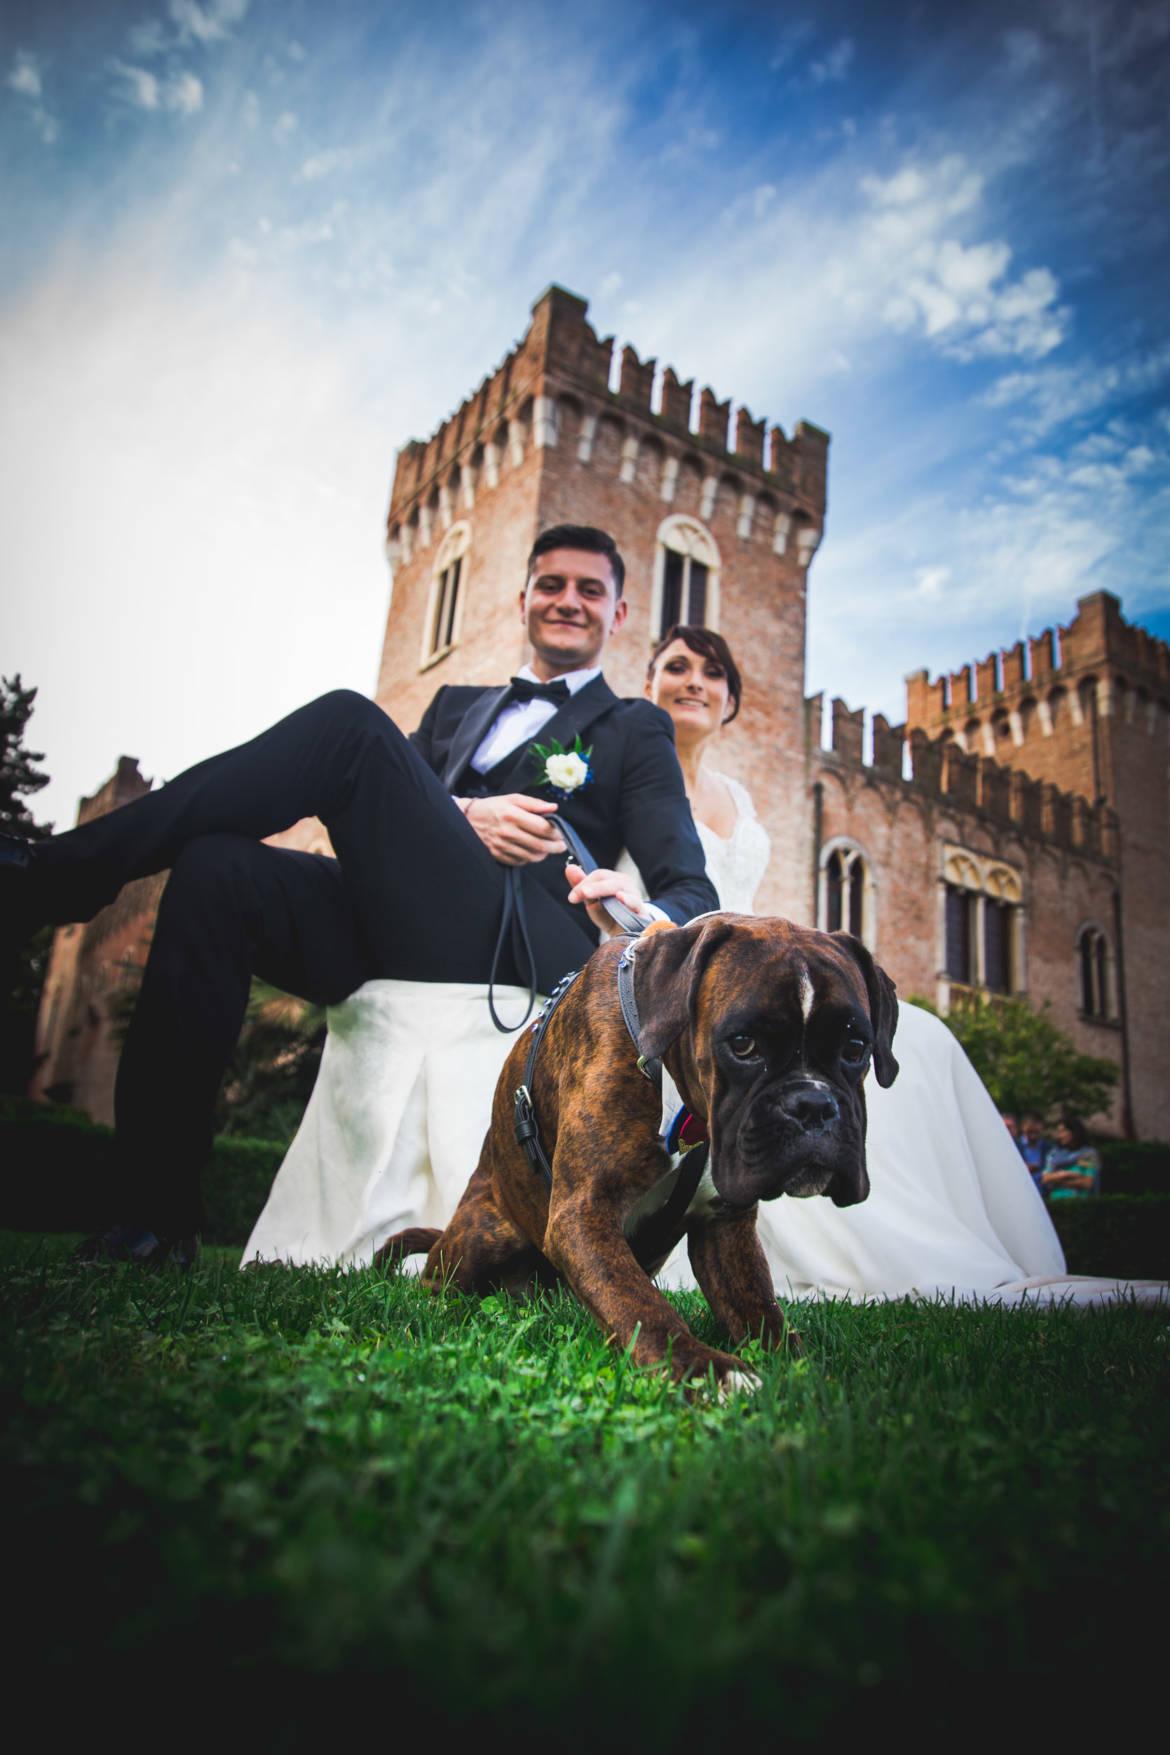 Matrimonio-Daniele-e-Nicoletta-338.jpg